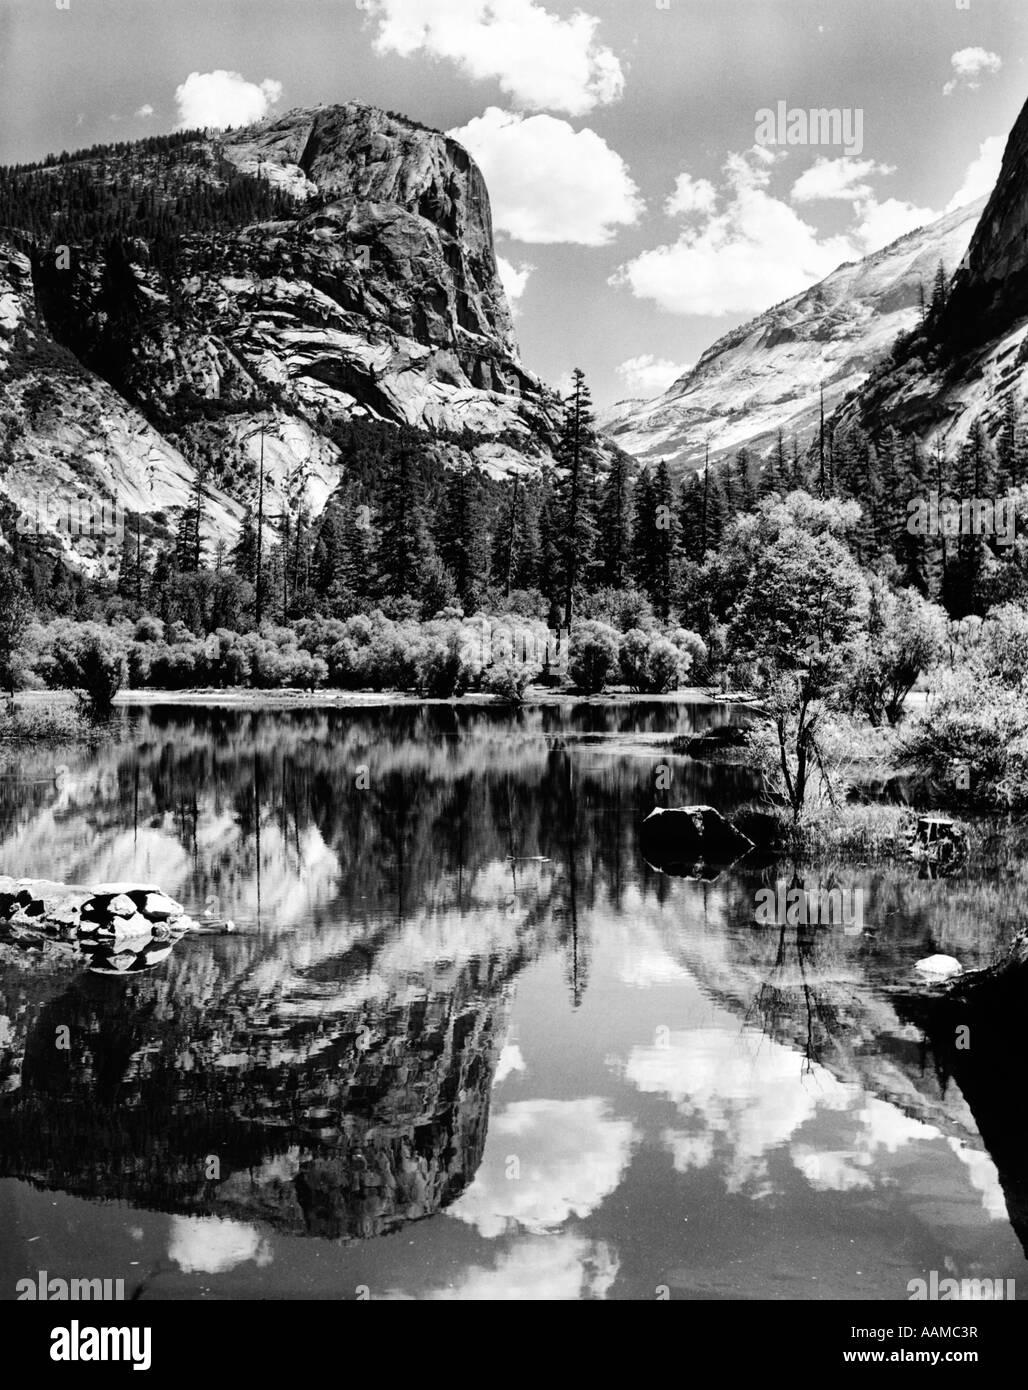 MOUNTAINS LAKE REFLECTION - Stock Image